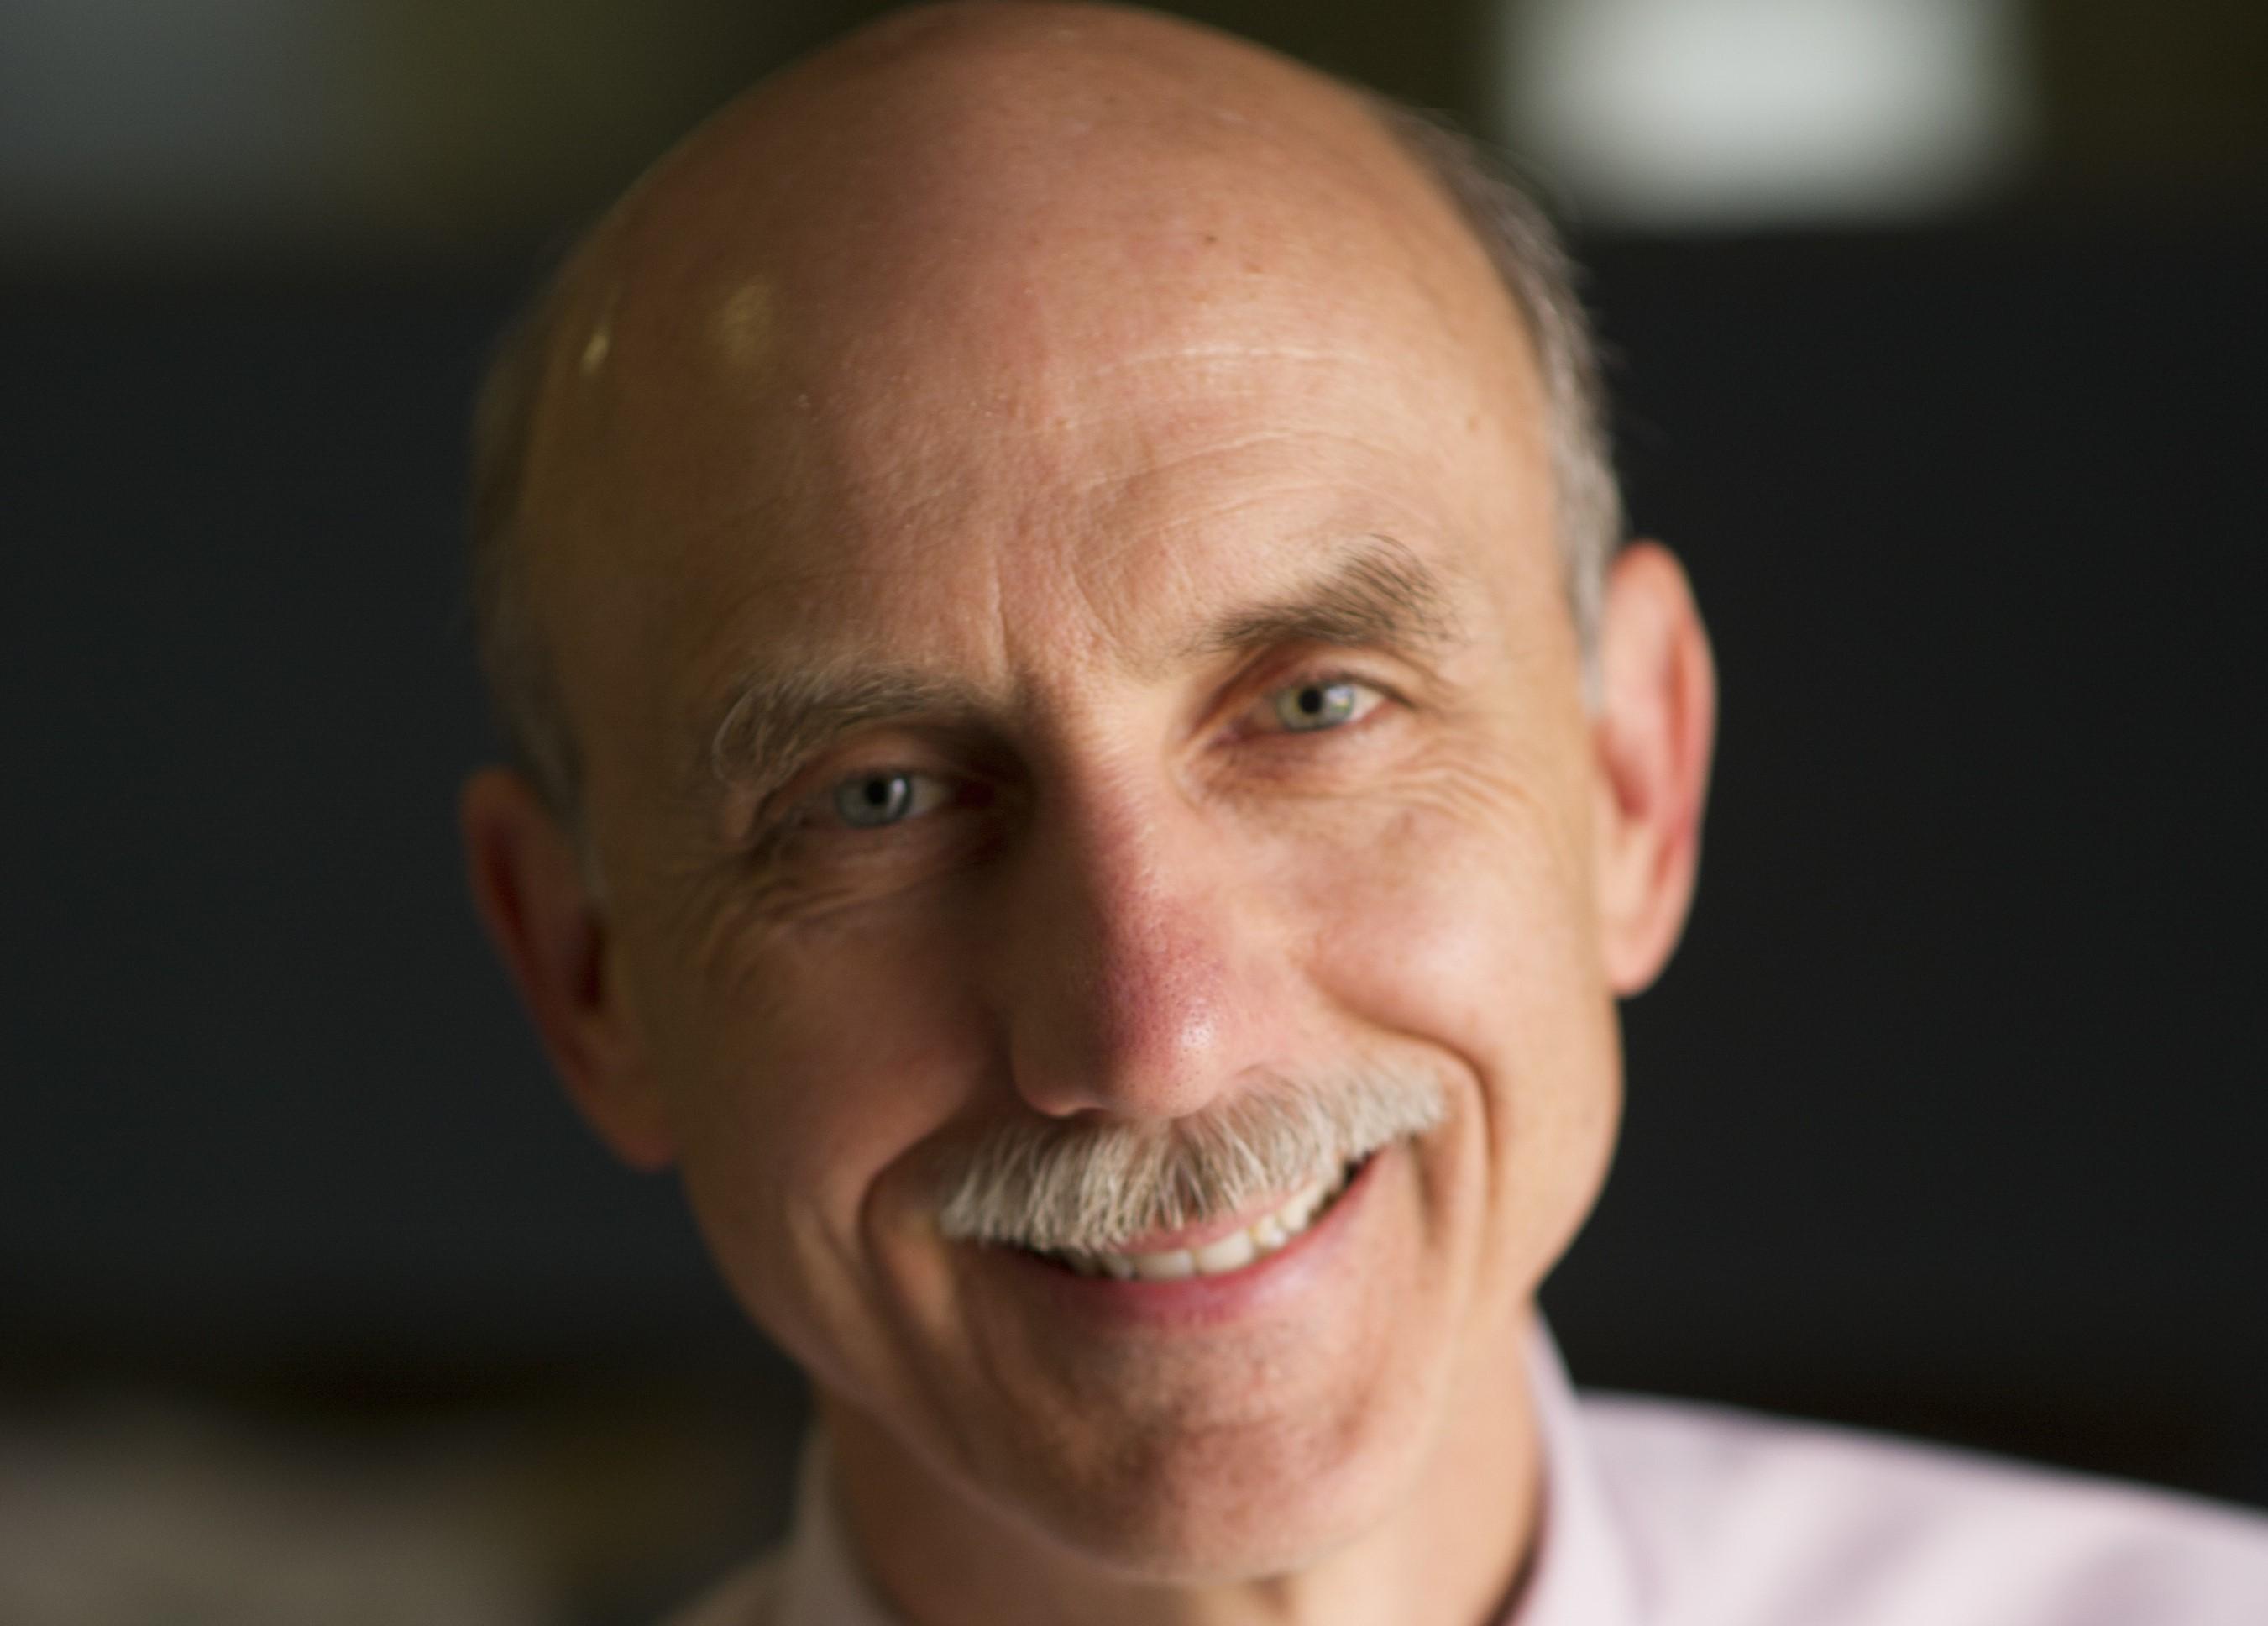 Executive Director of Good Works, a Coatesville Nonprofit, Receives Prestigious Award